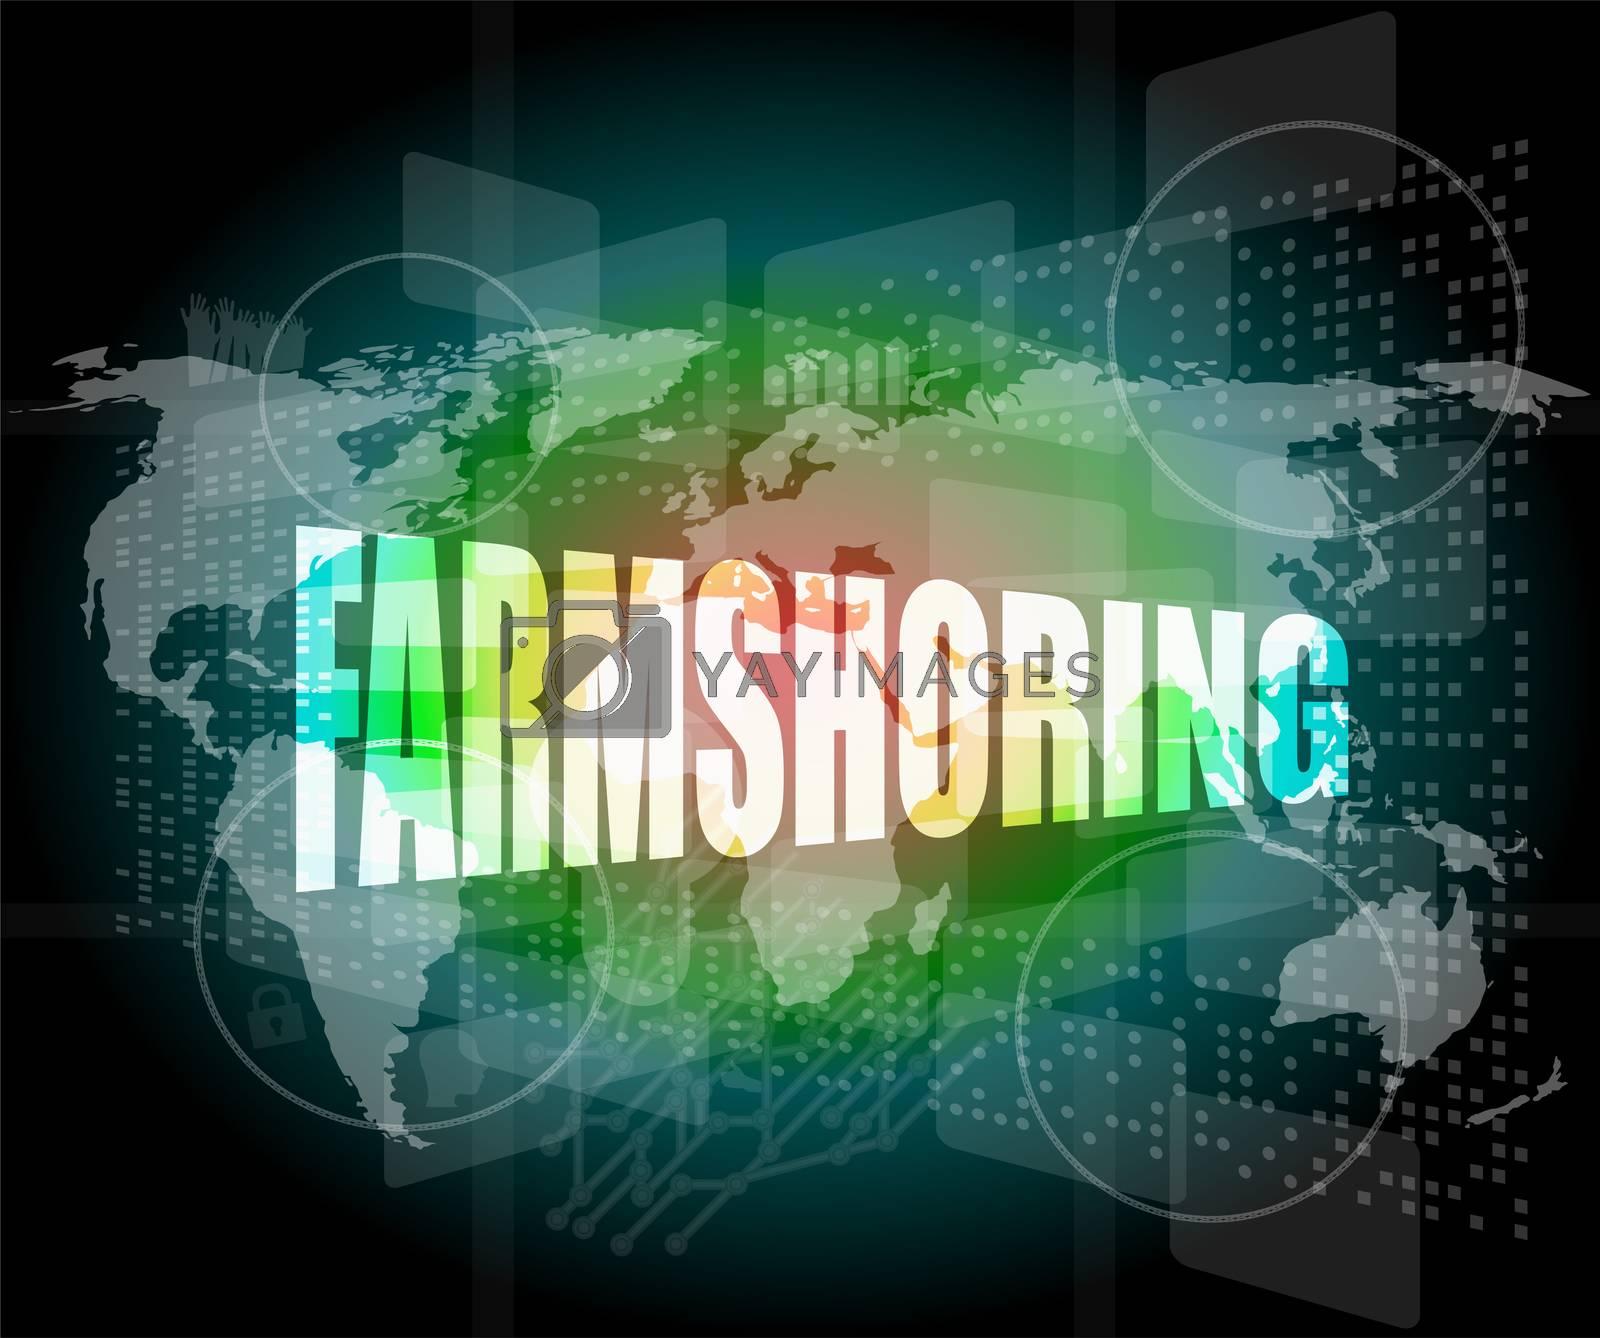 farmshoring, interface hi technology, touch screen